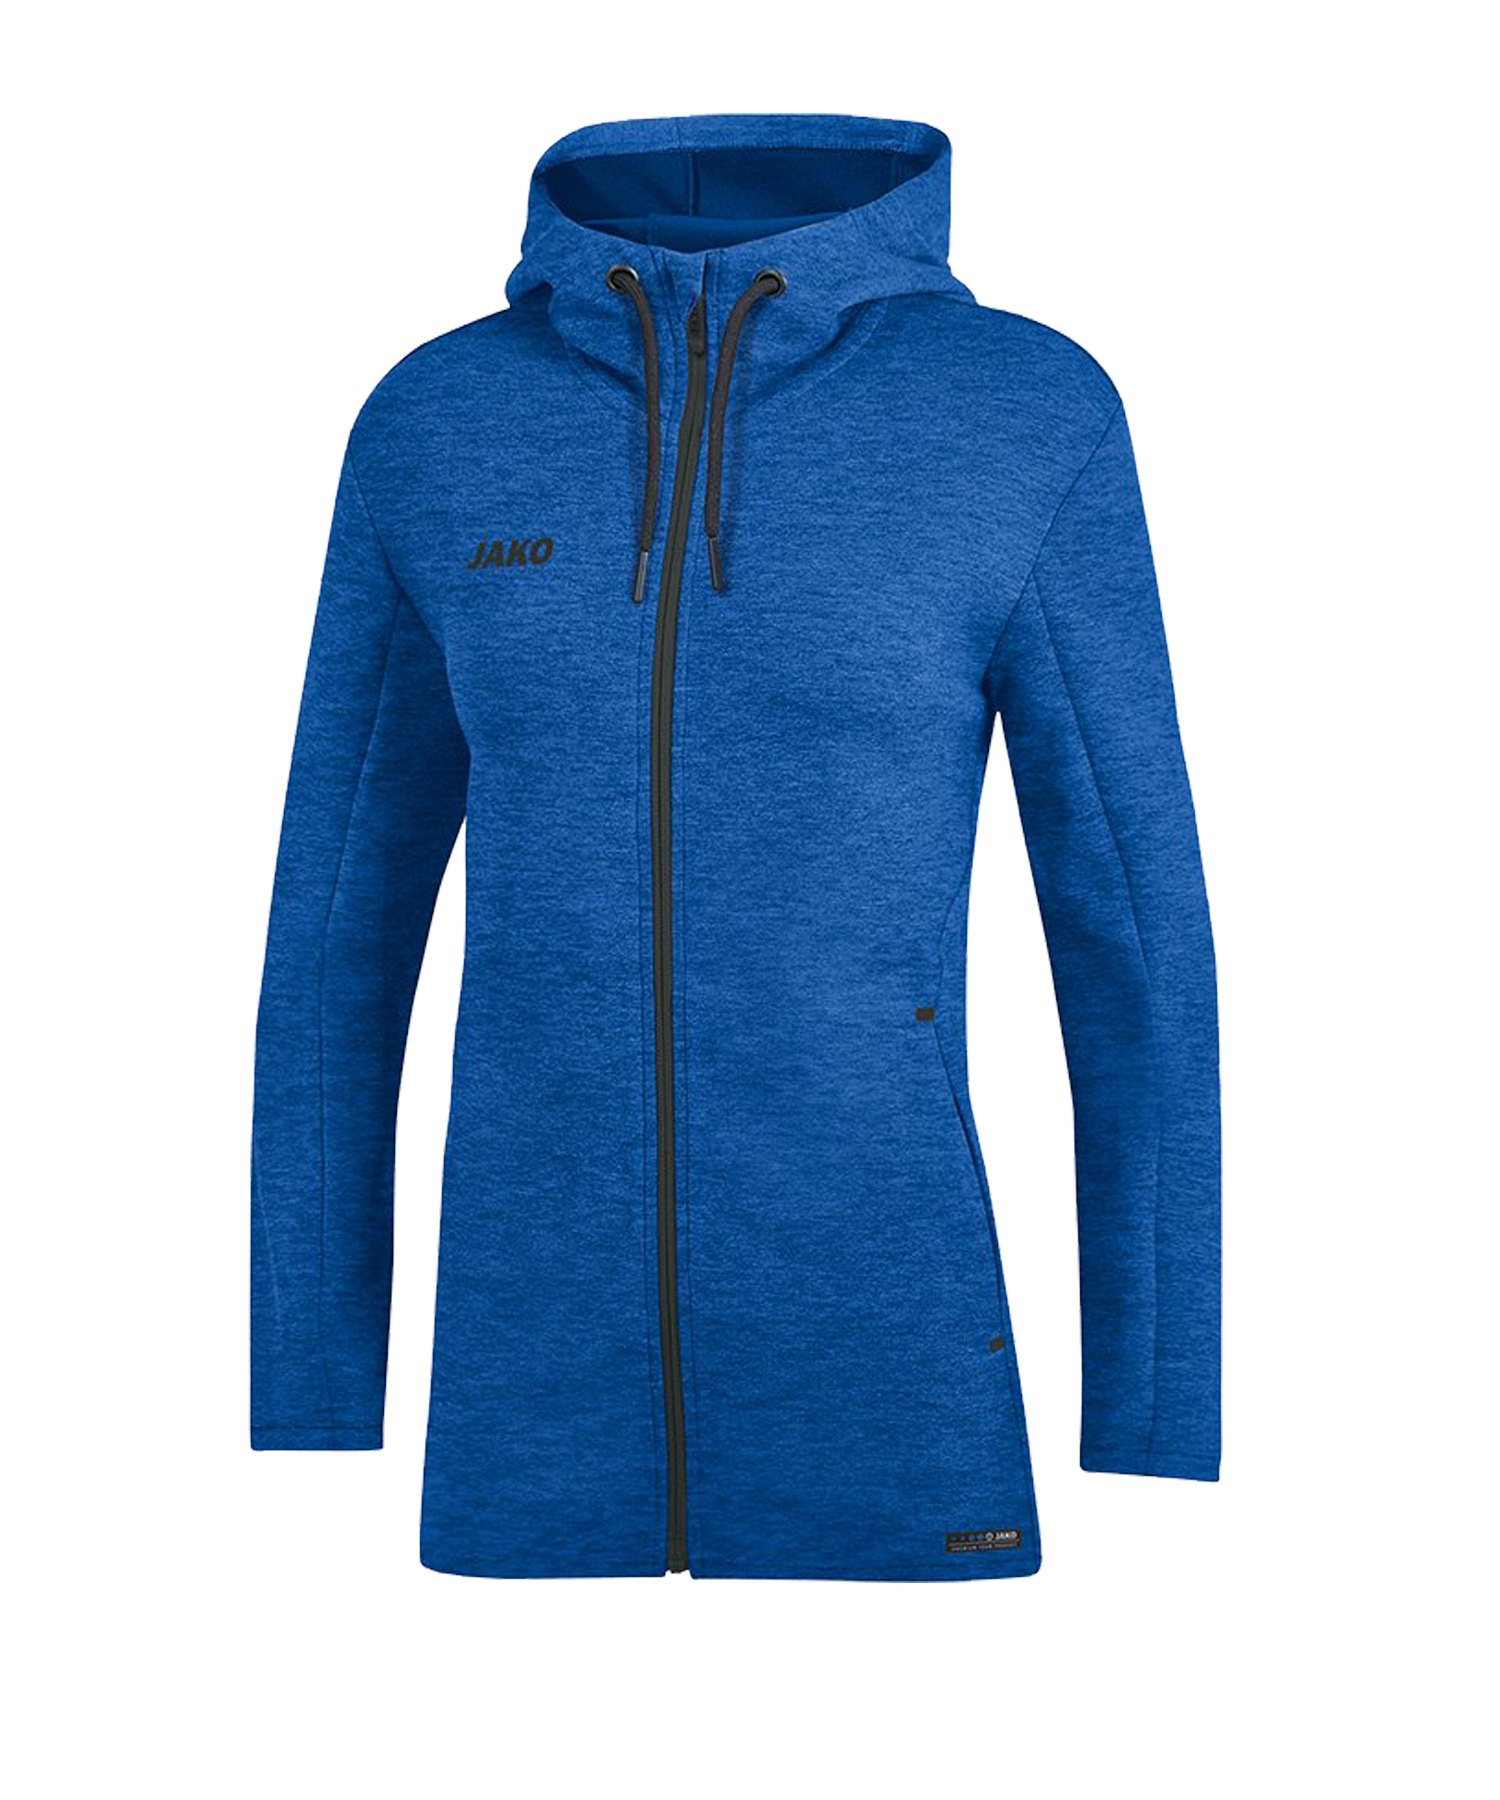 Jako Premium Basic Kapuzenjacke Damen Blau F04 - blau